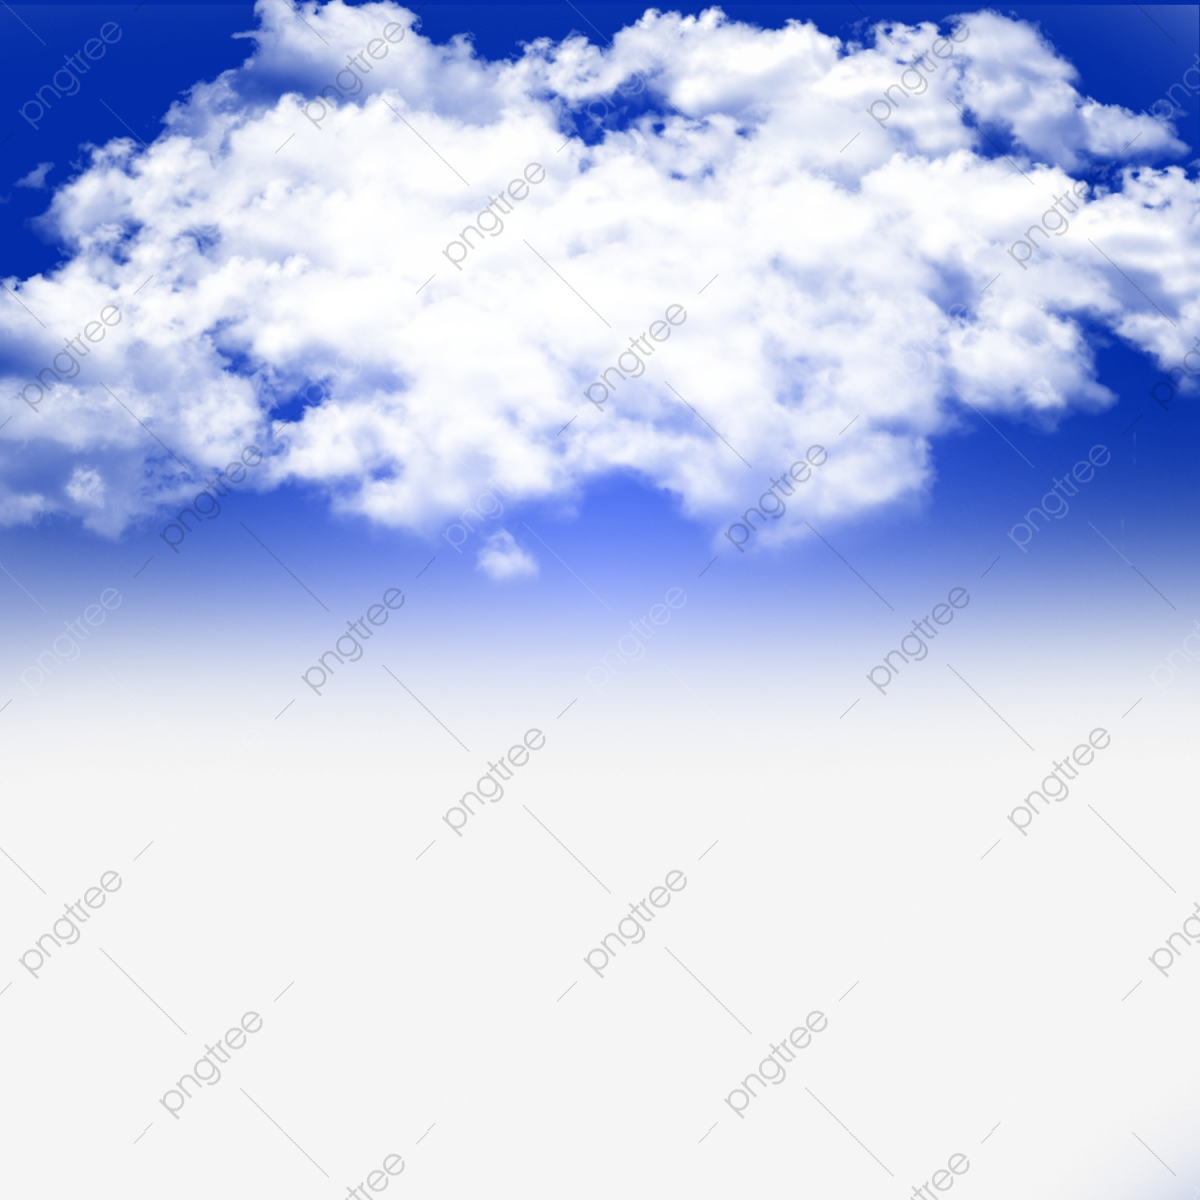 Transparent Cloudy Clipart - Cloudy Weather Clipart Gif, HD Png Download , Transparent  Png Image - PNGitem